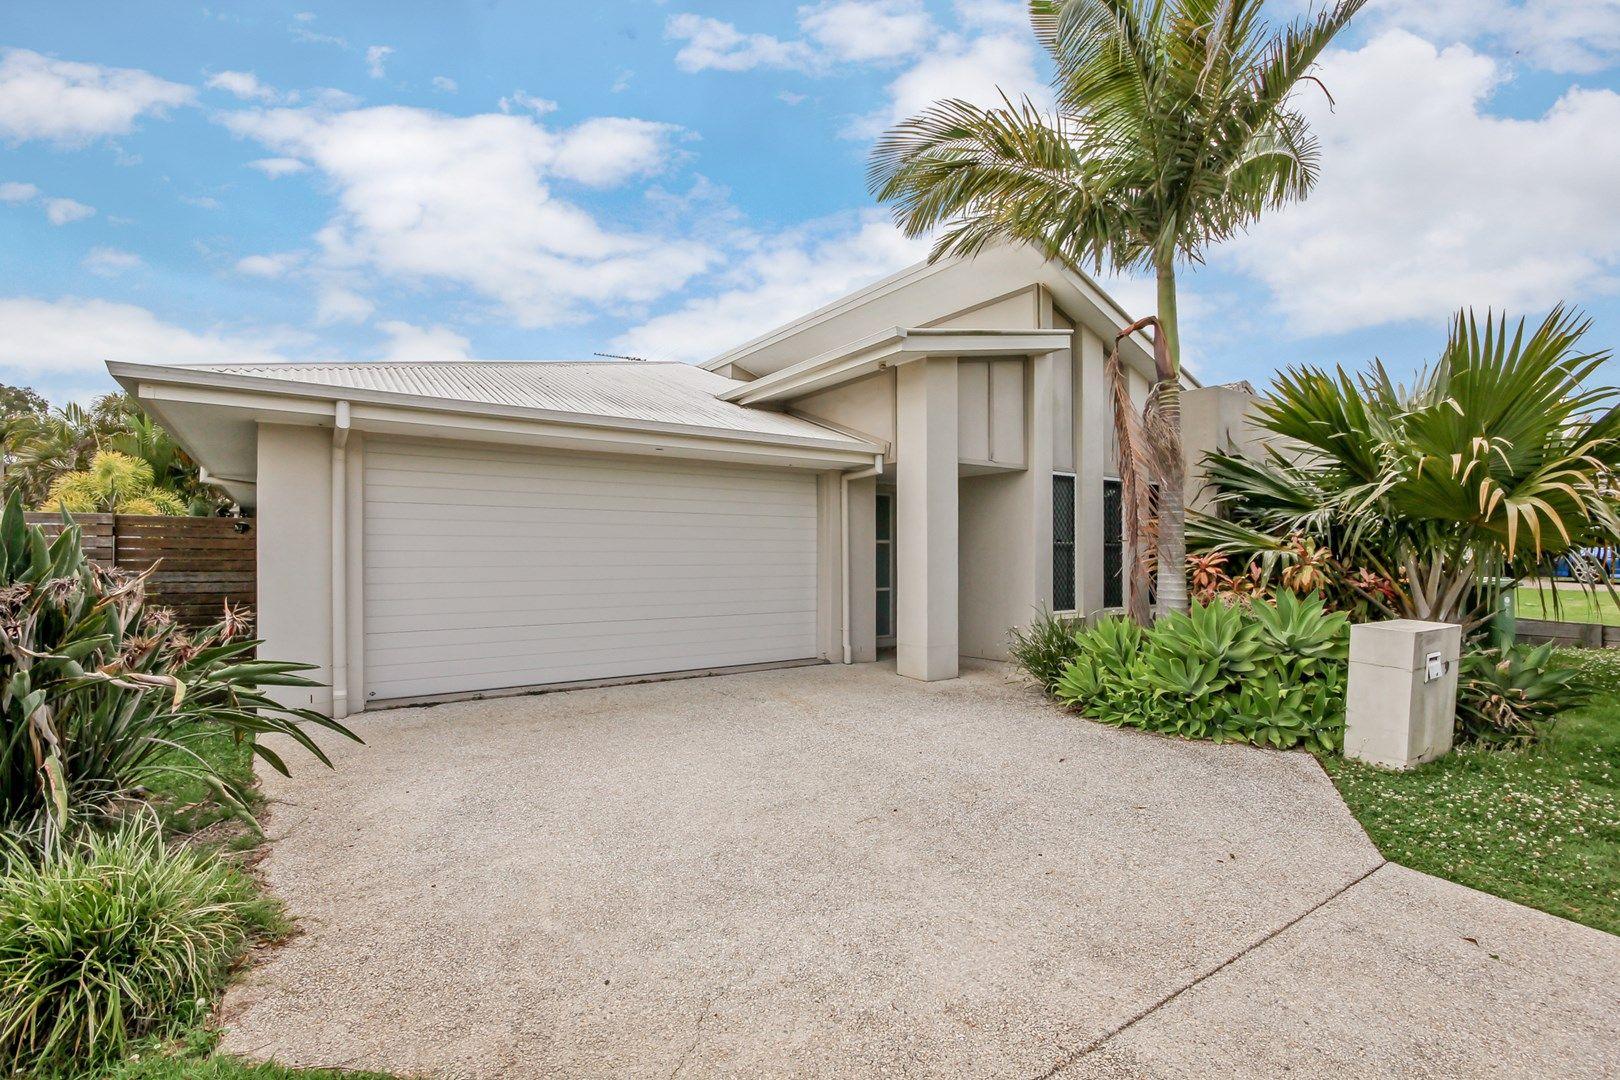 9 Parklane Road, Victoria Point QLD 4165, Image 0